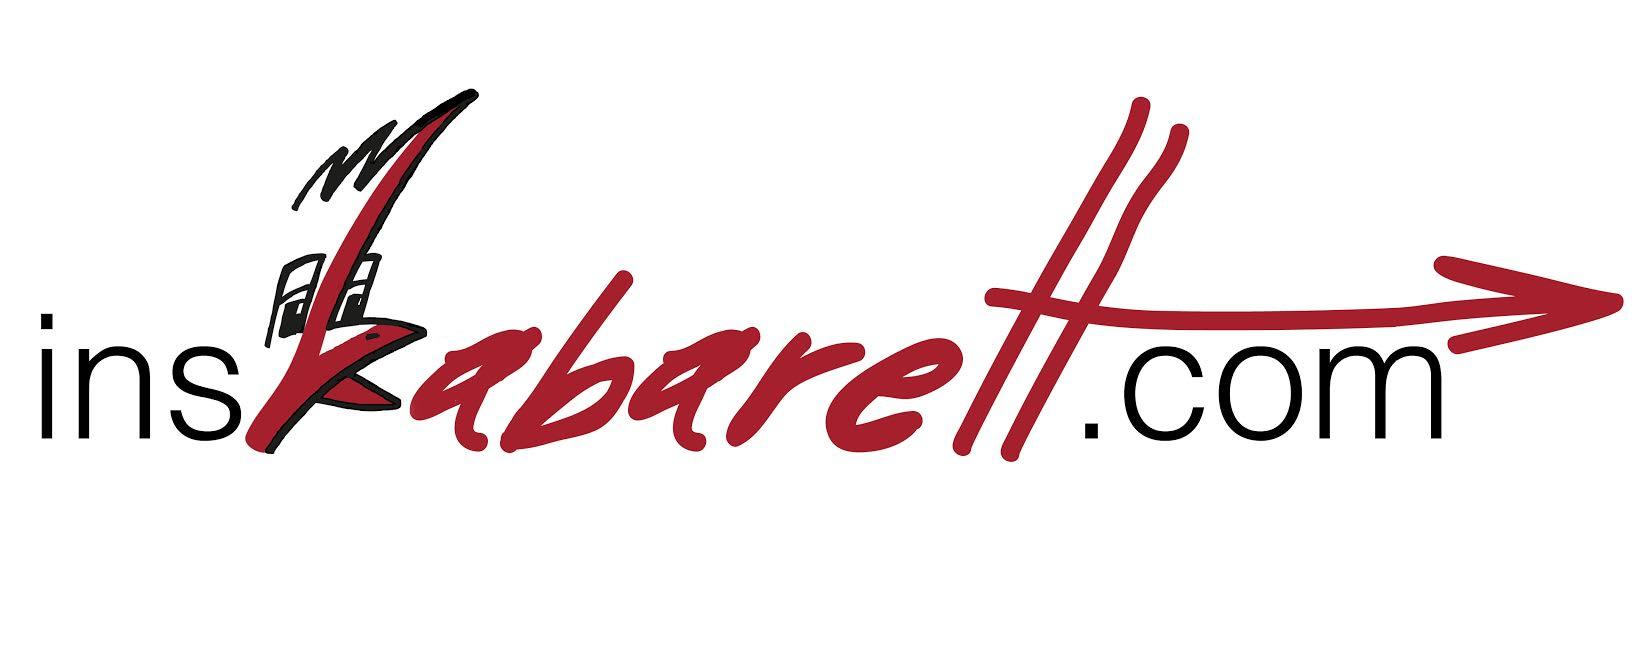 logo_inskabarett